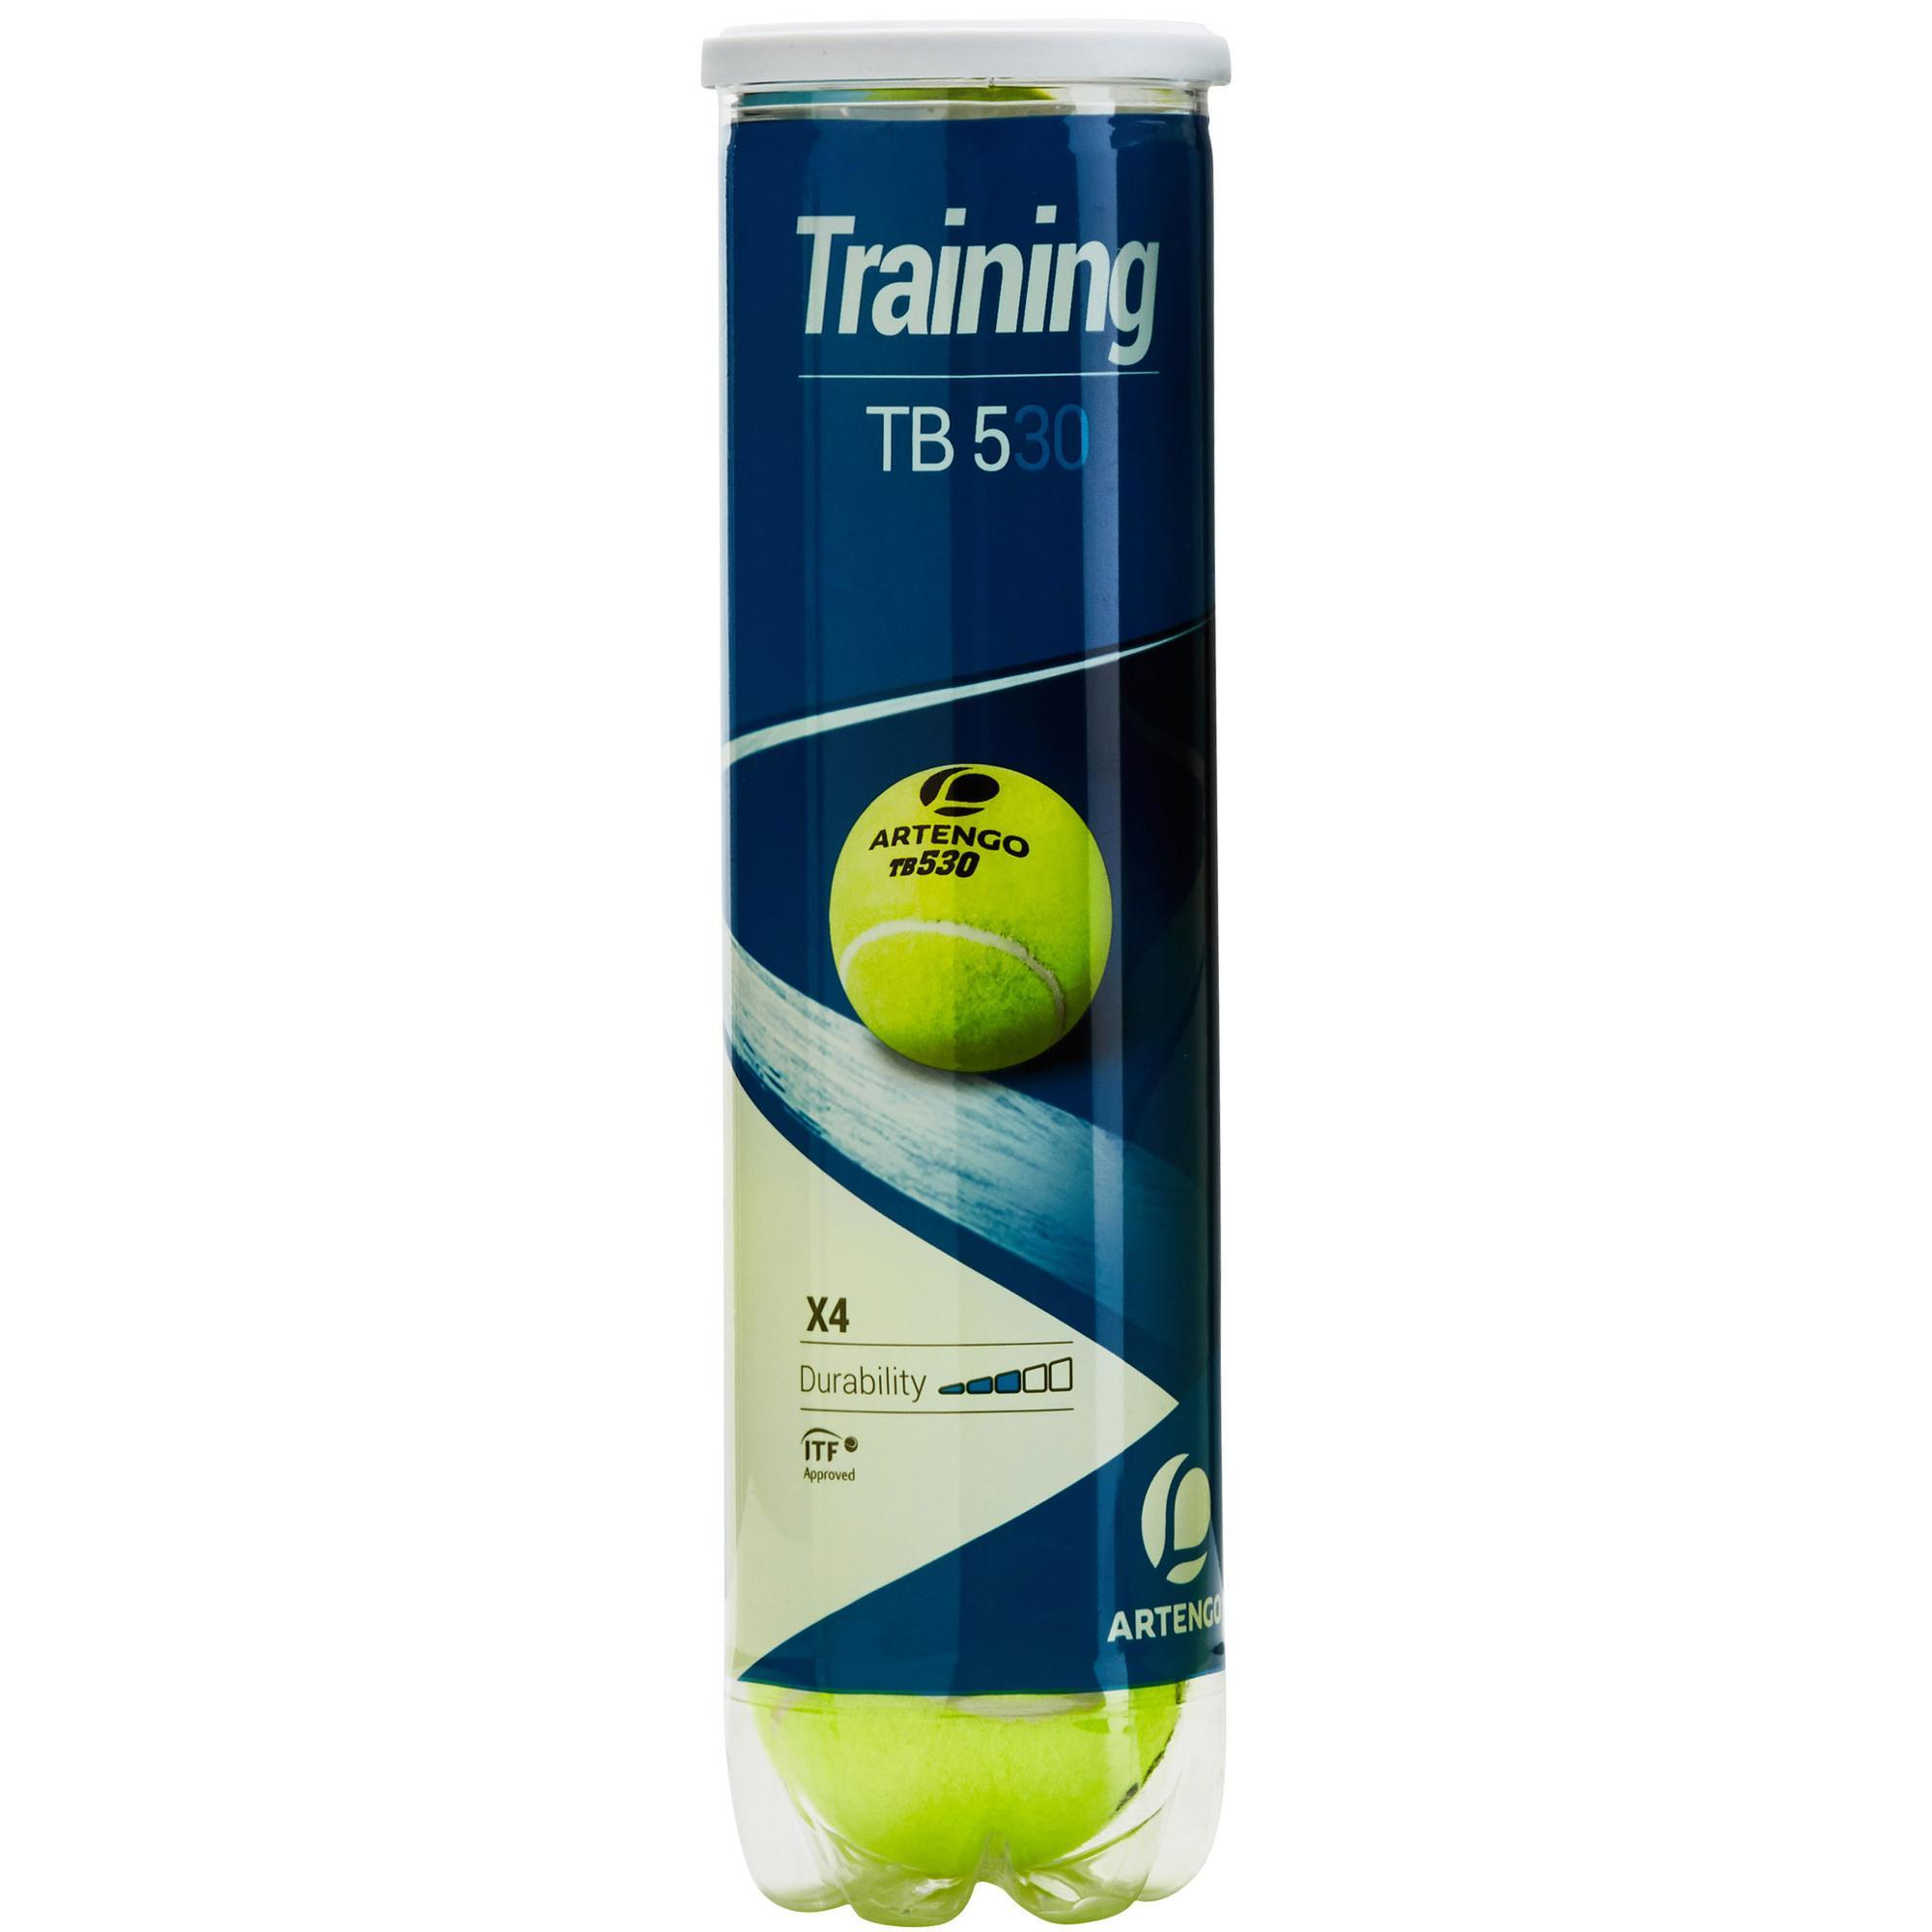 Artengo Tennisballen TB530 x4